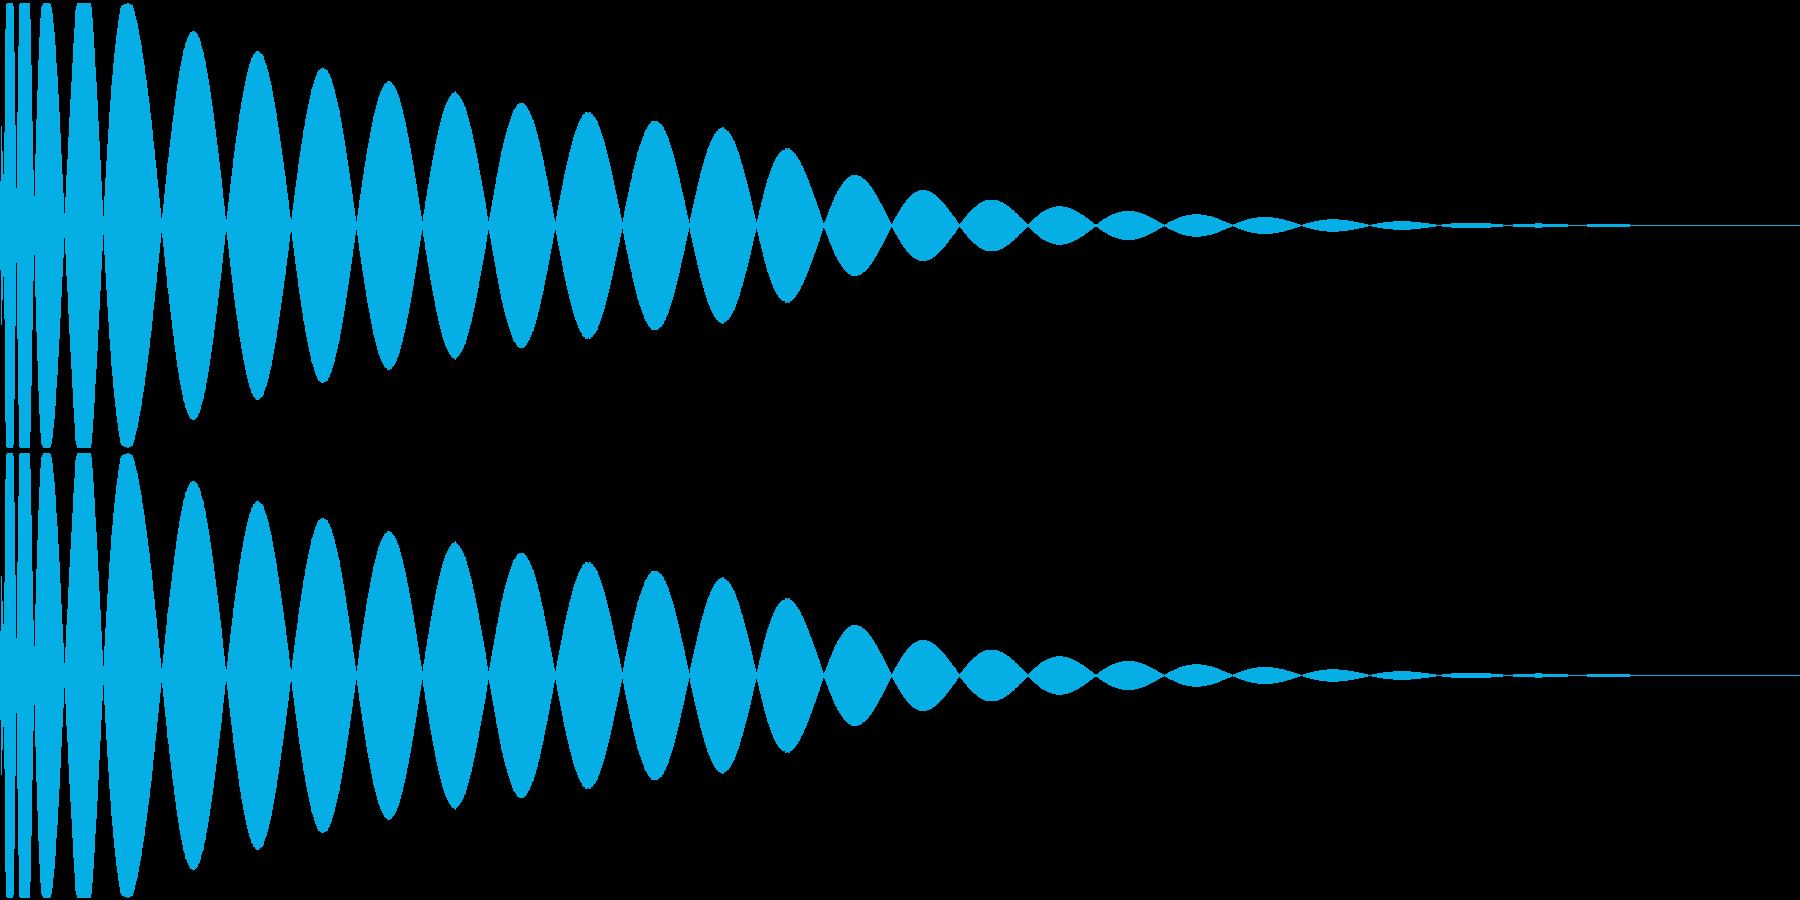 DTM Kick 90 オリジナル音源の再生済みの波形